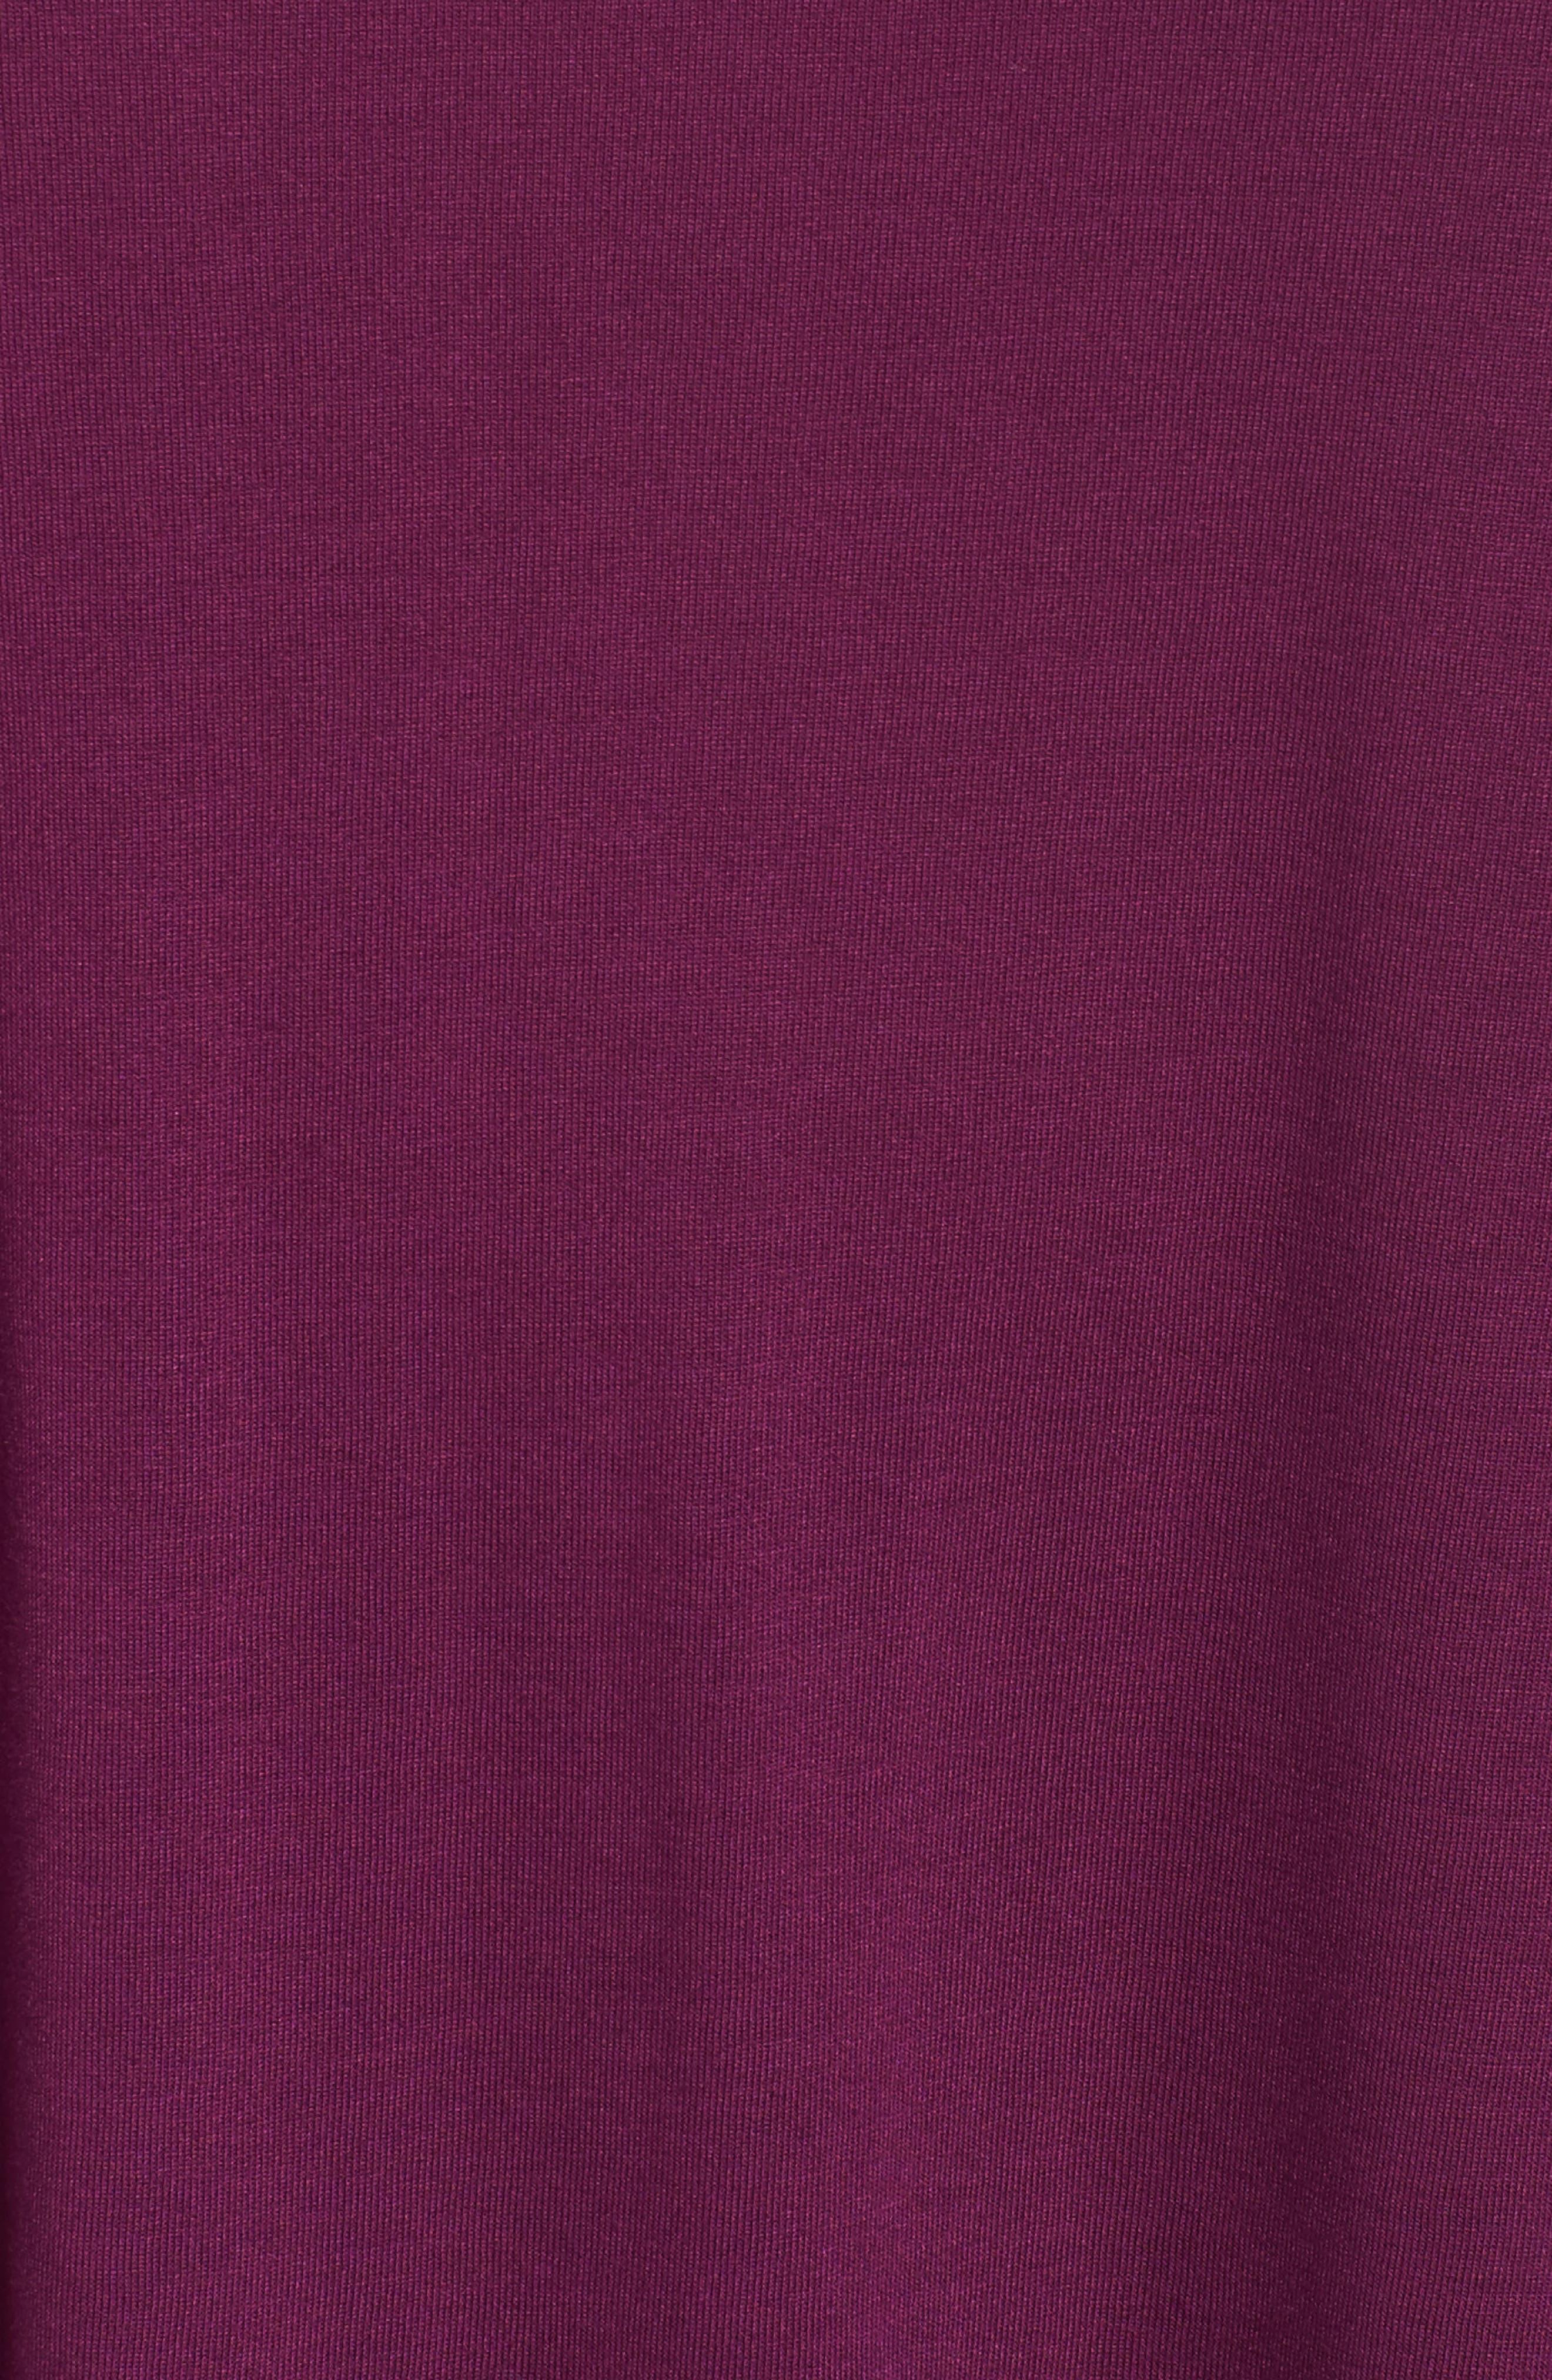 Bell Sleeve Tee,                             Alternate thumbnail 5, color,                             Purple Dark